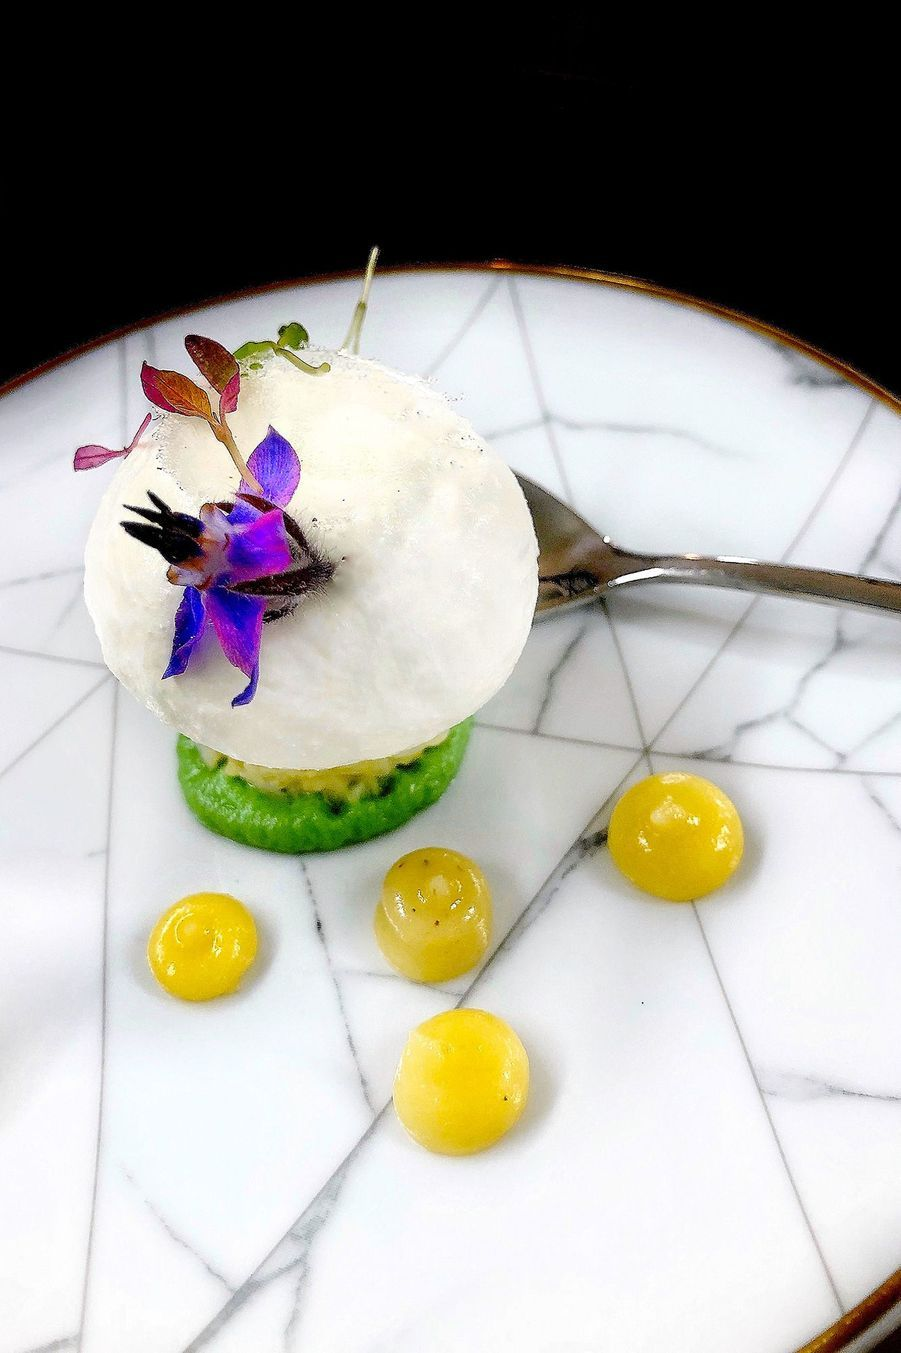 Dessert parJulien Montbabut.